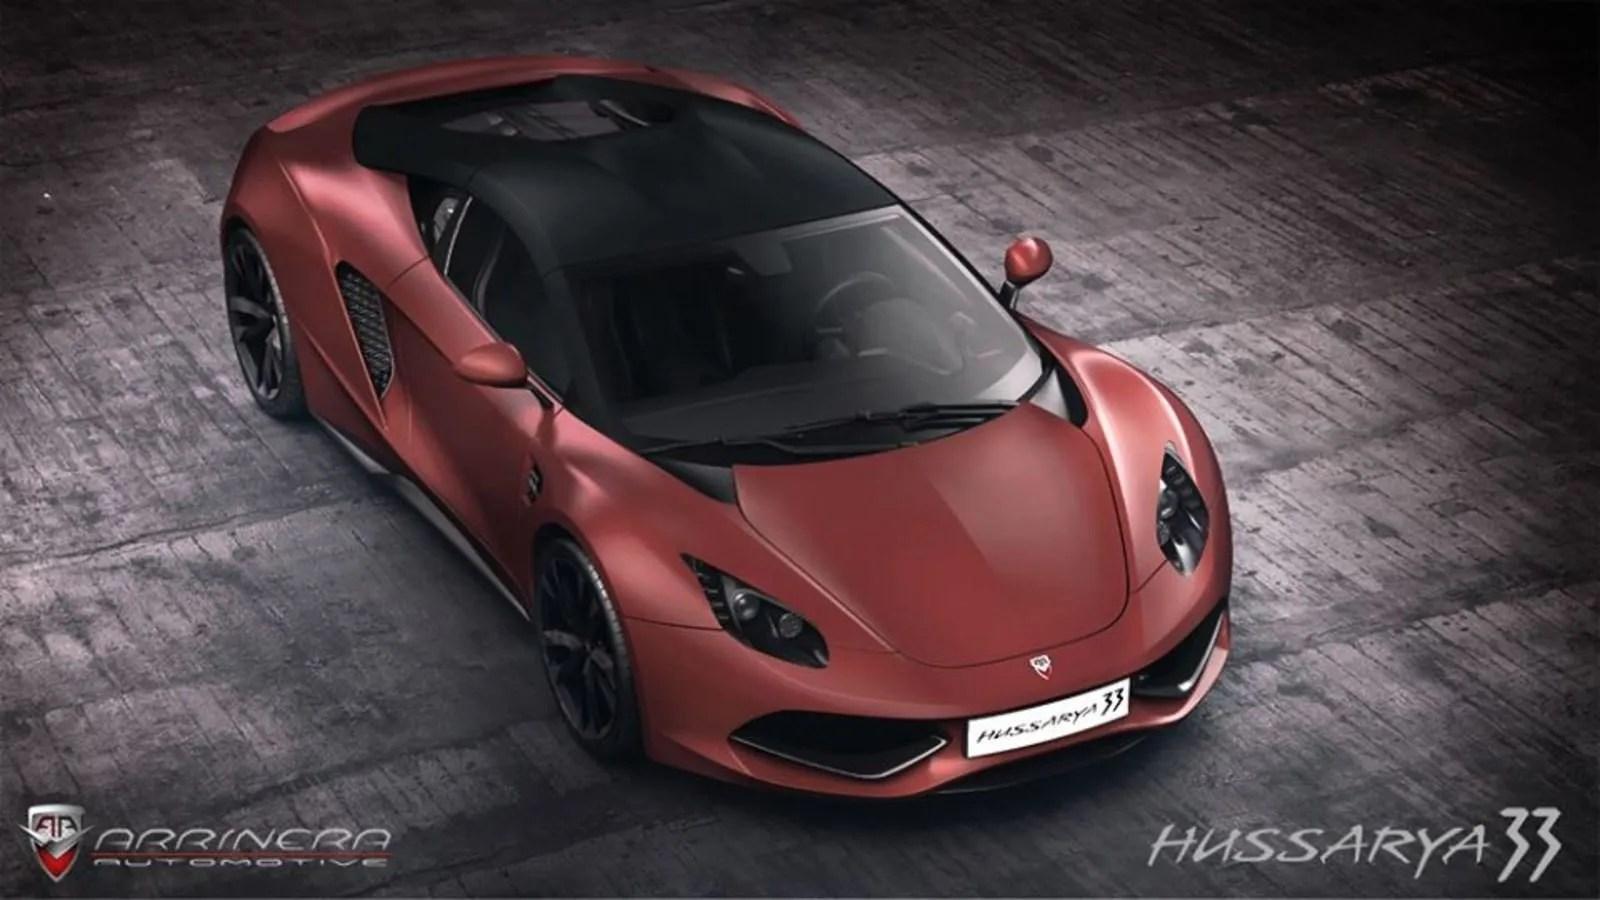 Car Interior Wallpaper 2015 Arrinera Hussarya 33 Review Top Speed